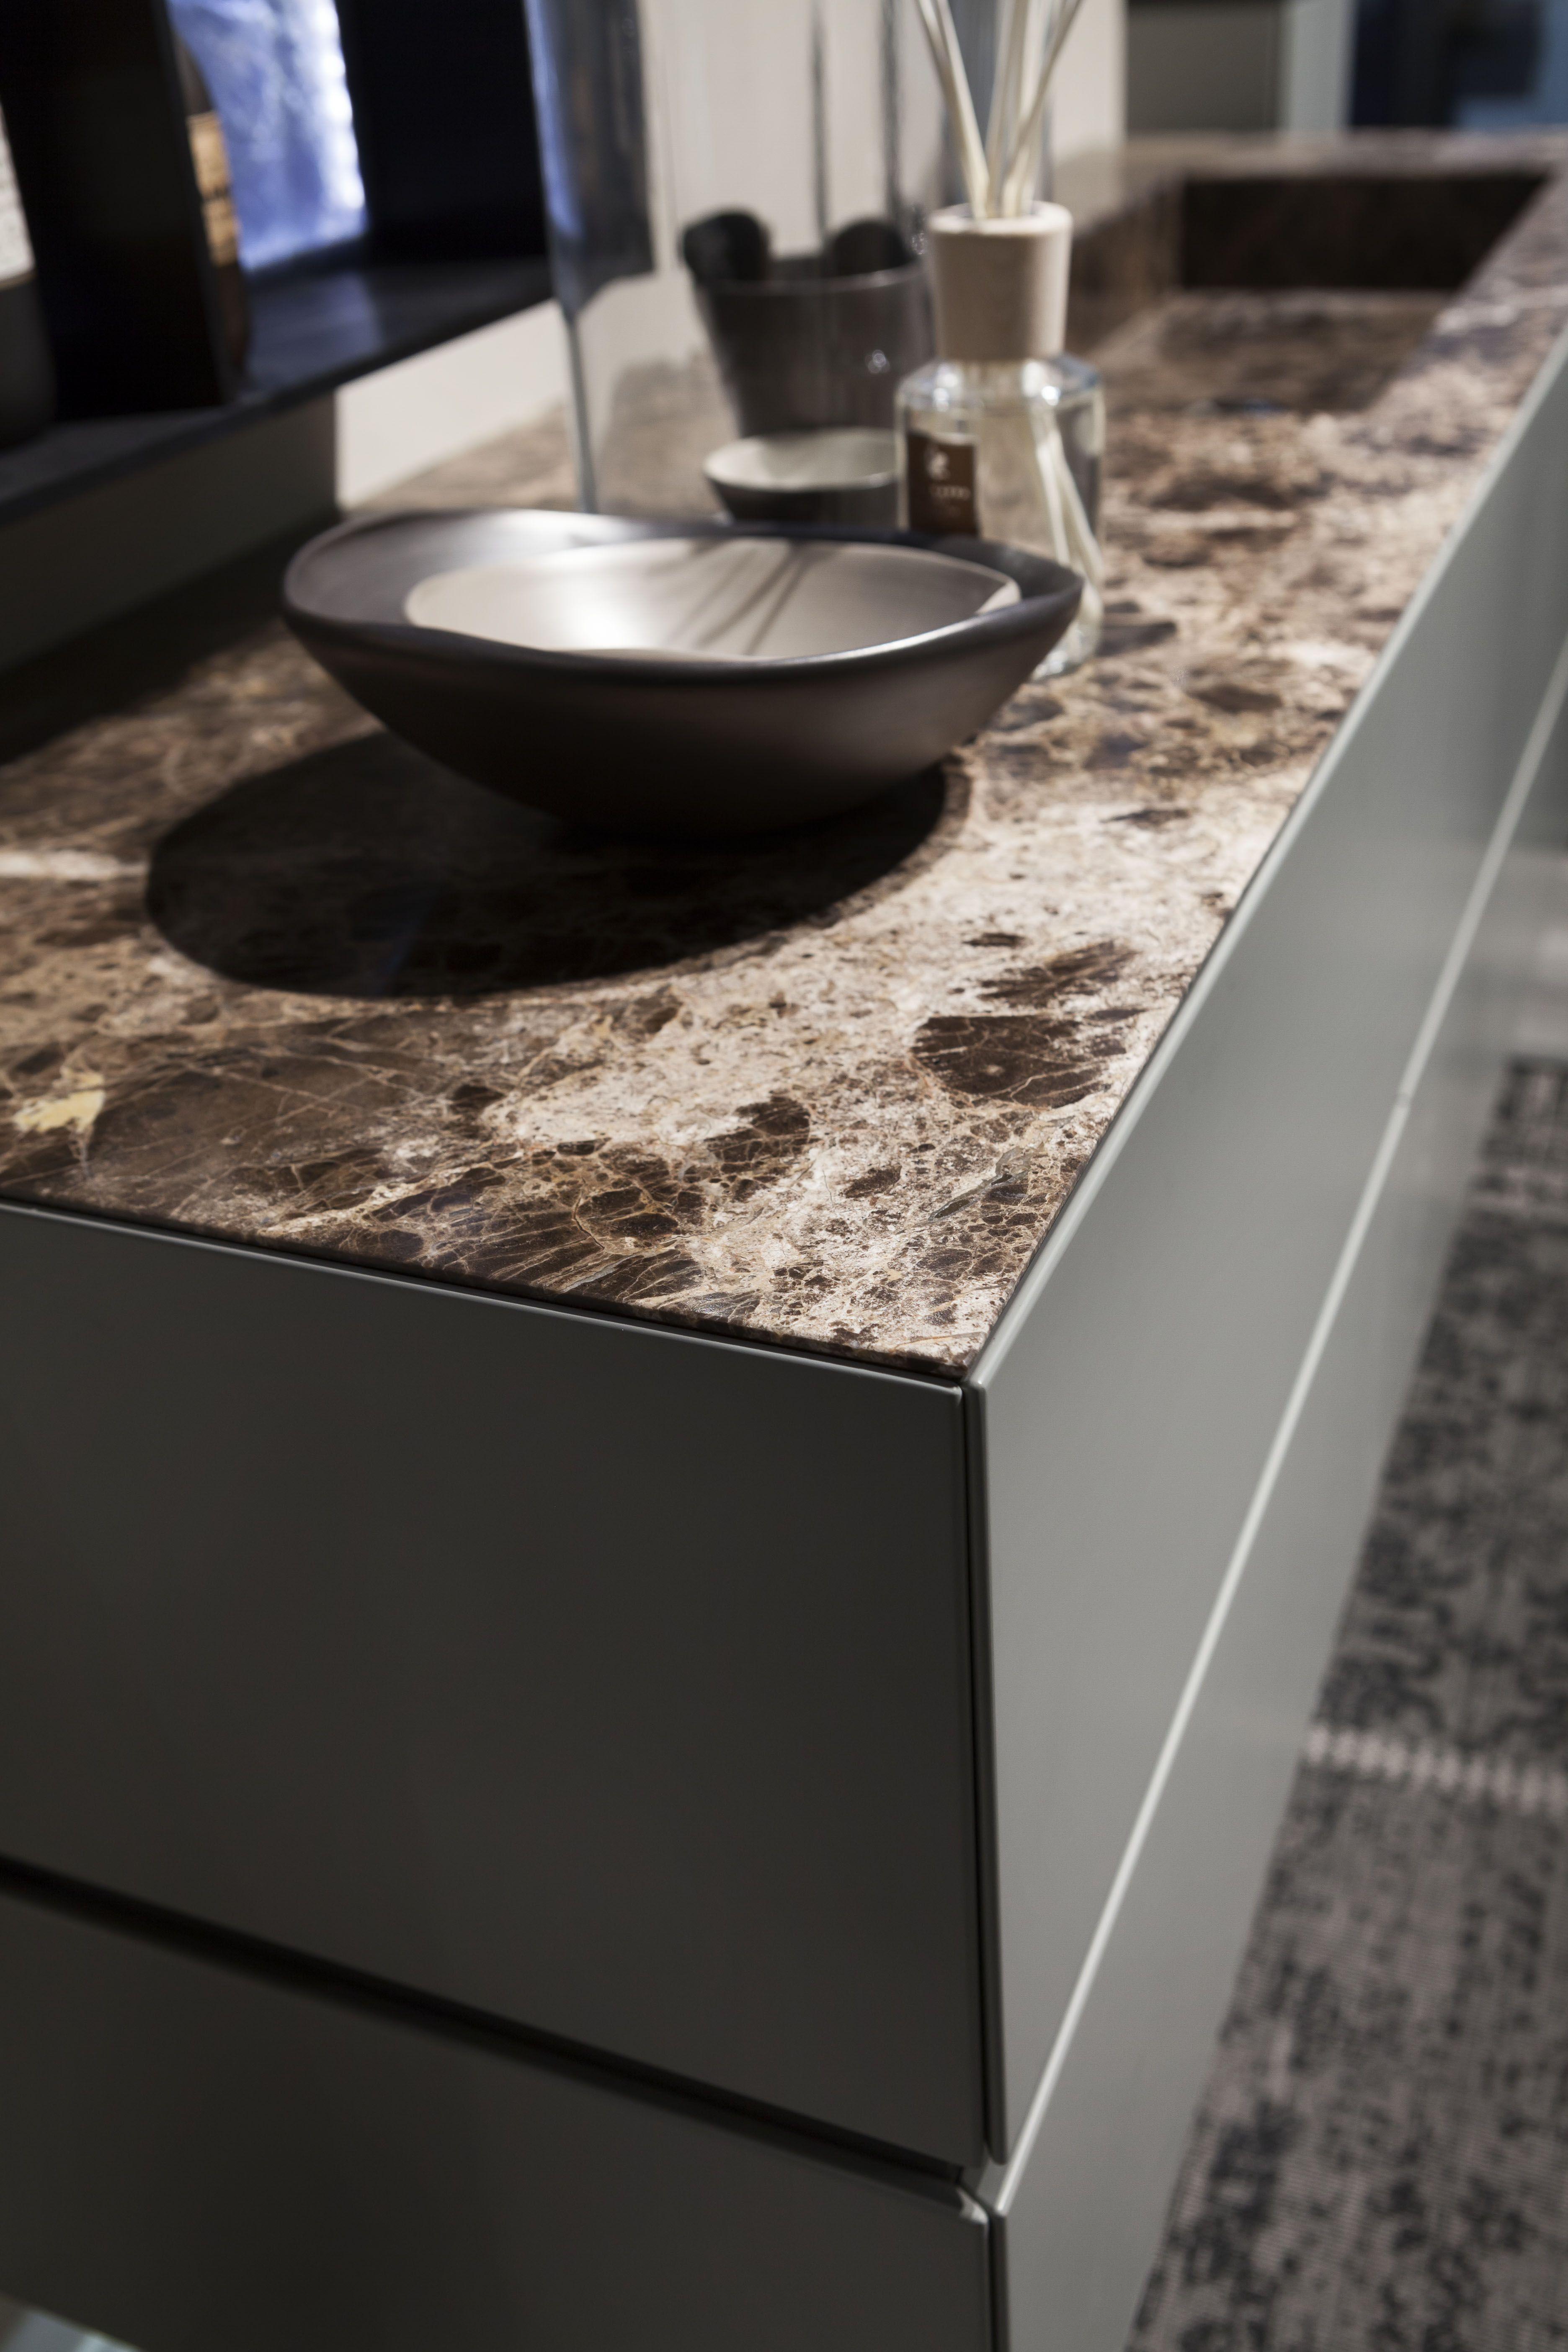 Dettagli novit salonebagno 2014 edon design nike bagno design e mobili - Agora mobili bagno ...